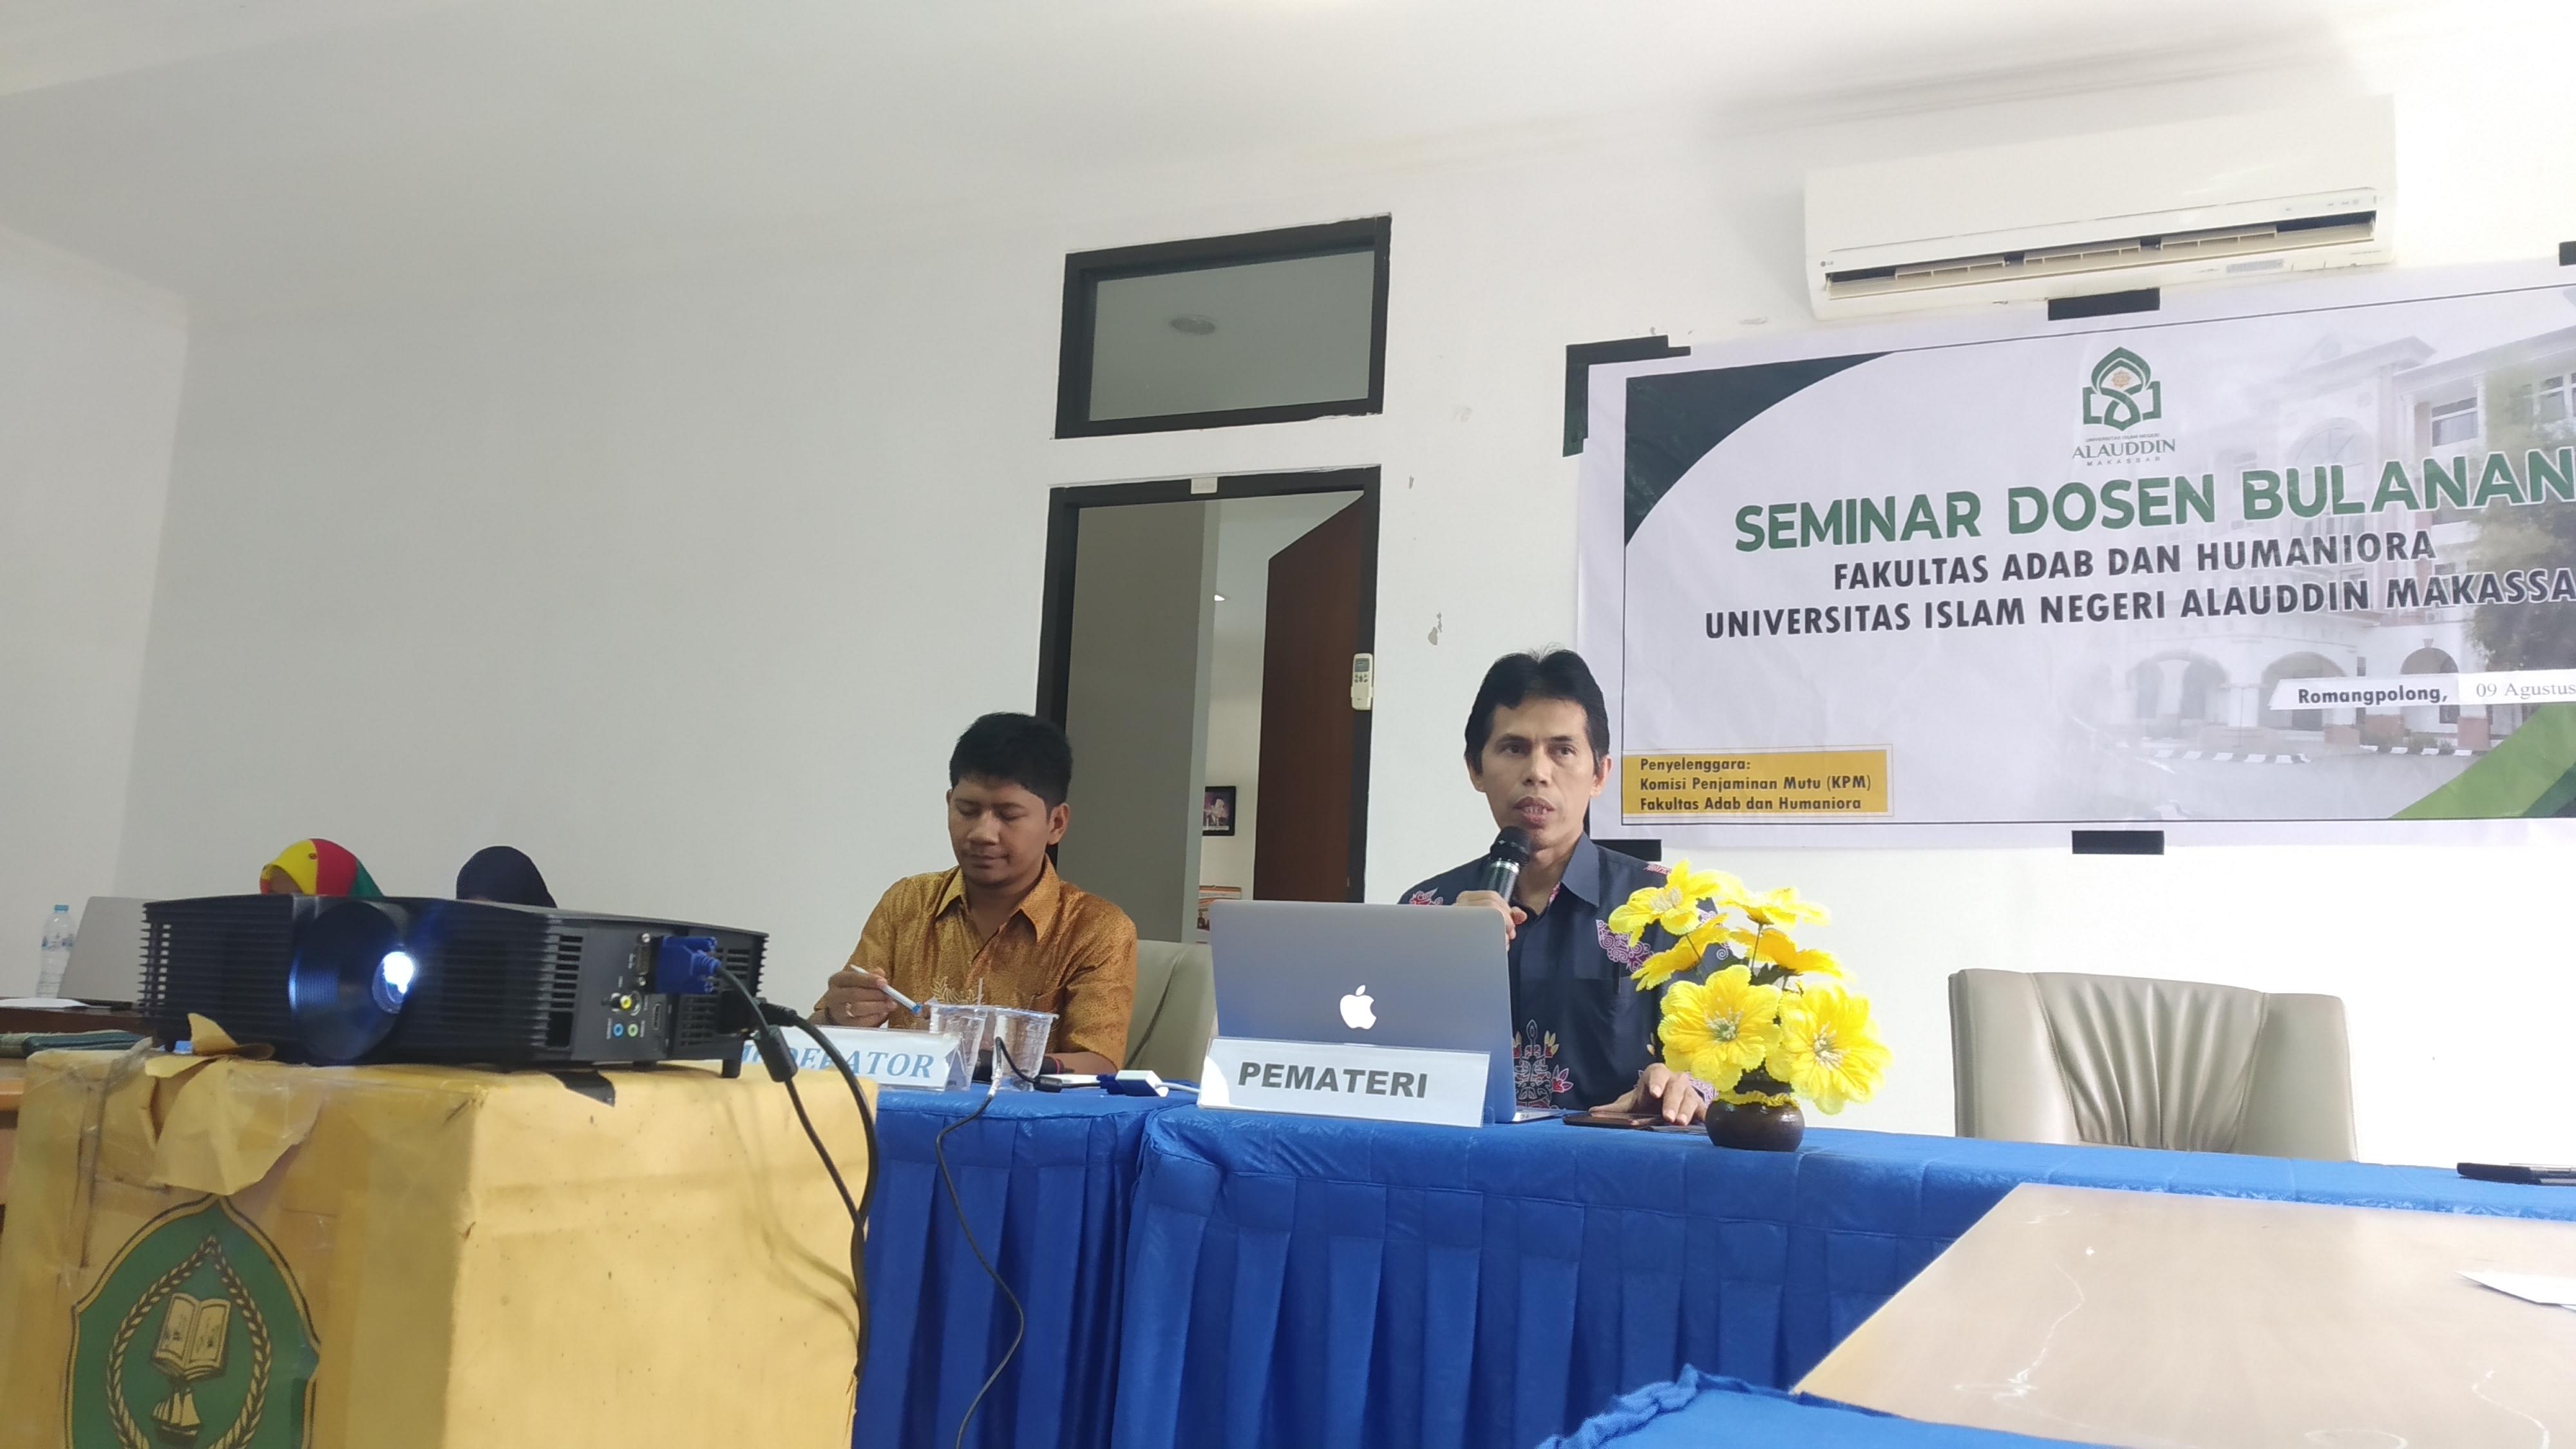 Seminar Epistemologi Islam oleh Dr. H. Barsihannor, M.Ag